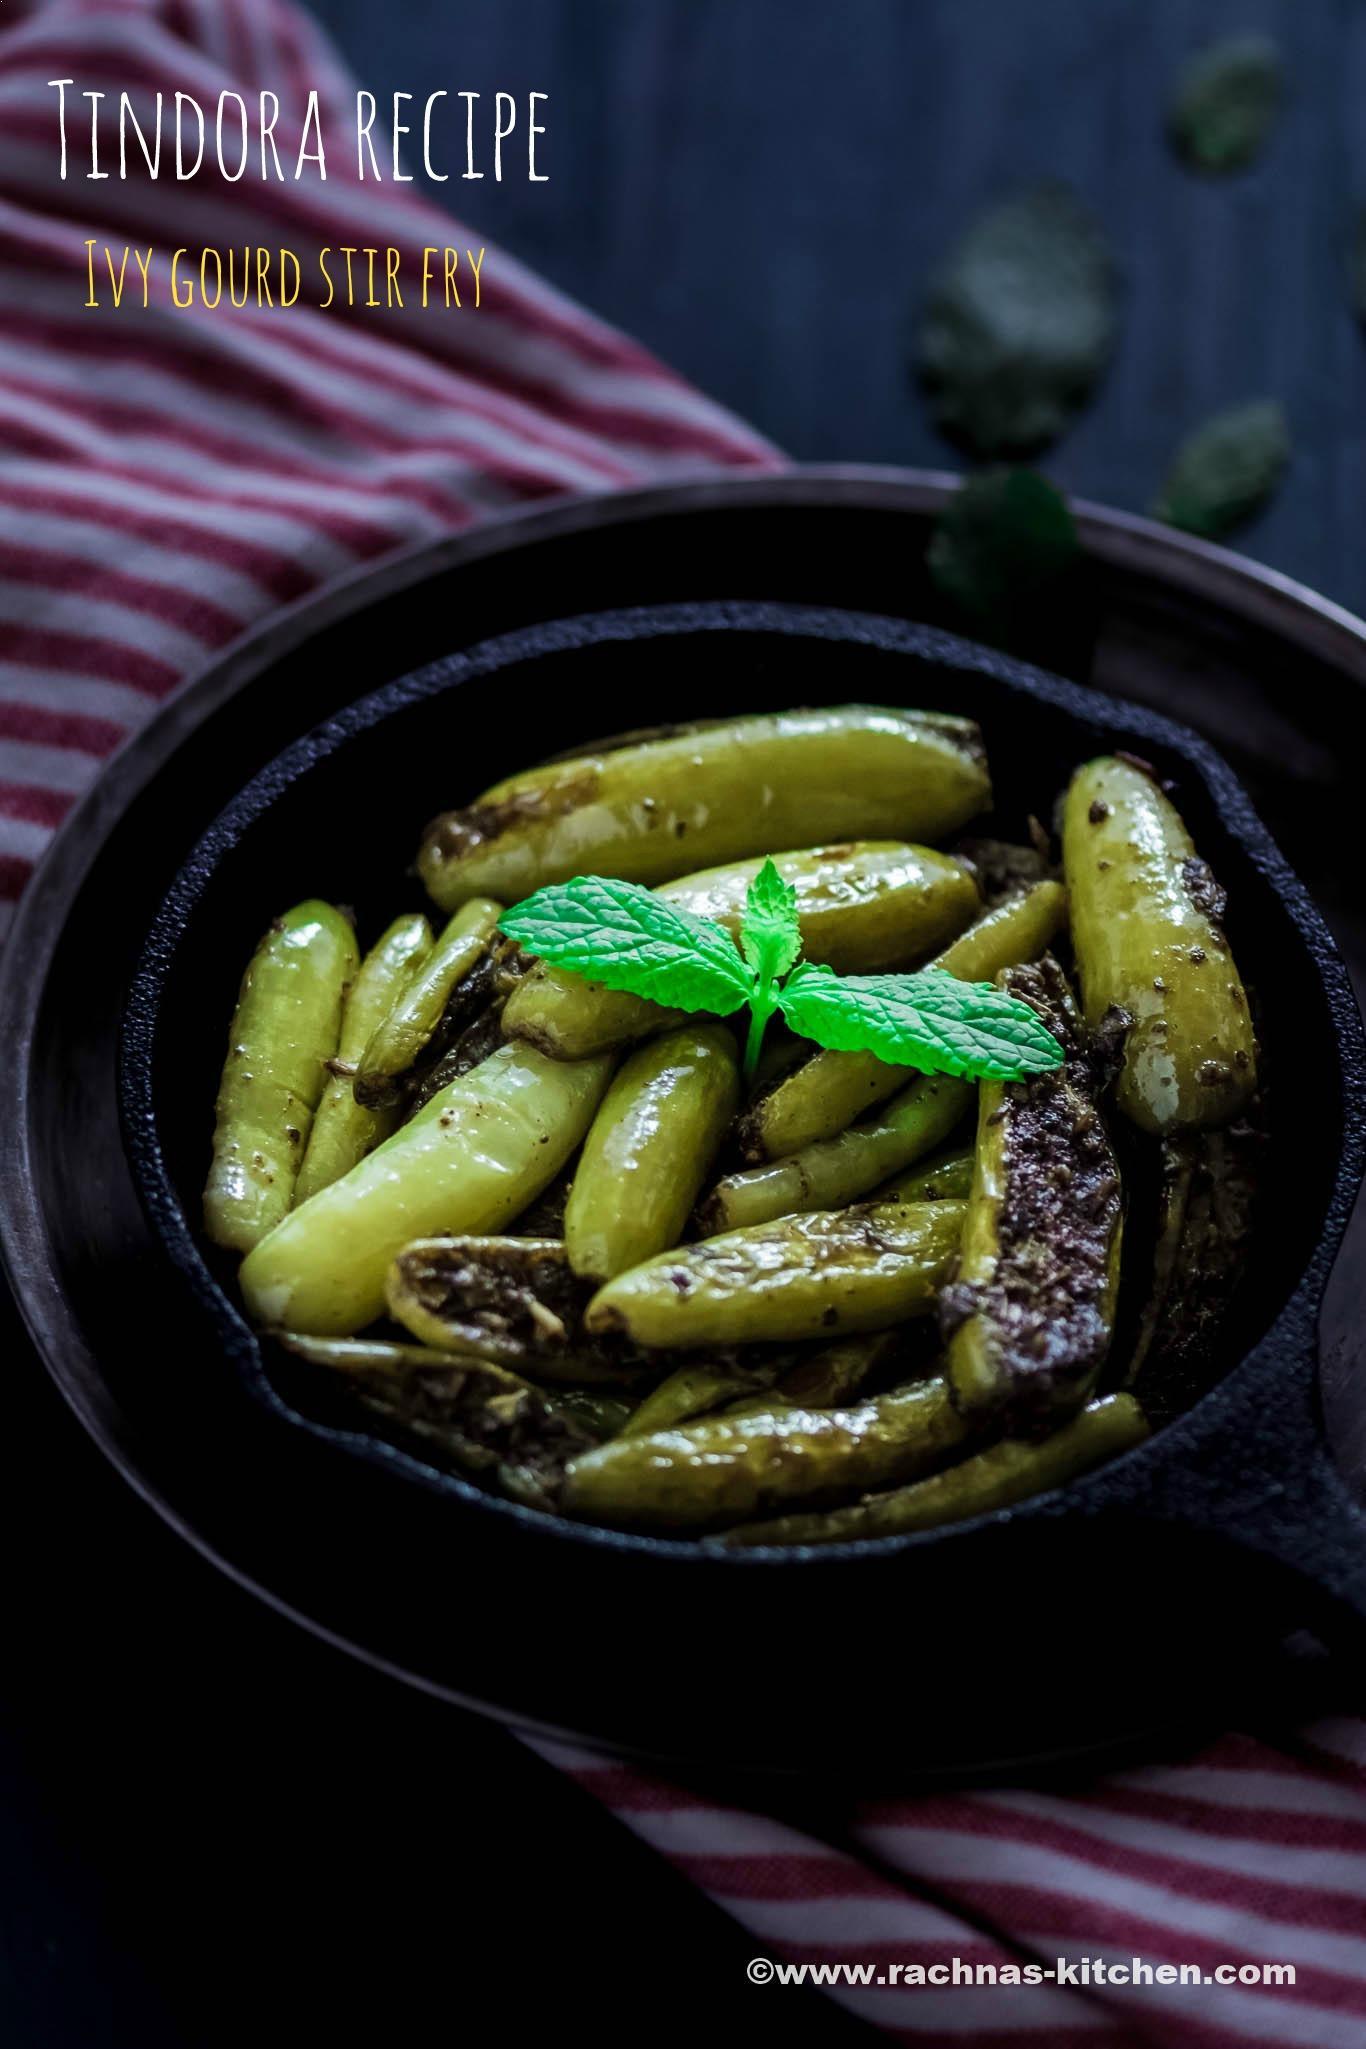 Tindora fry recipe